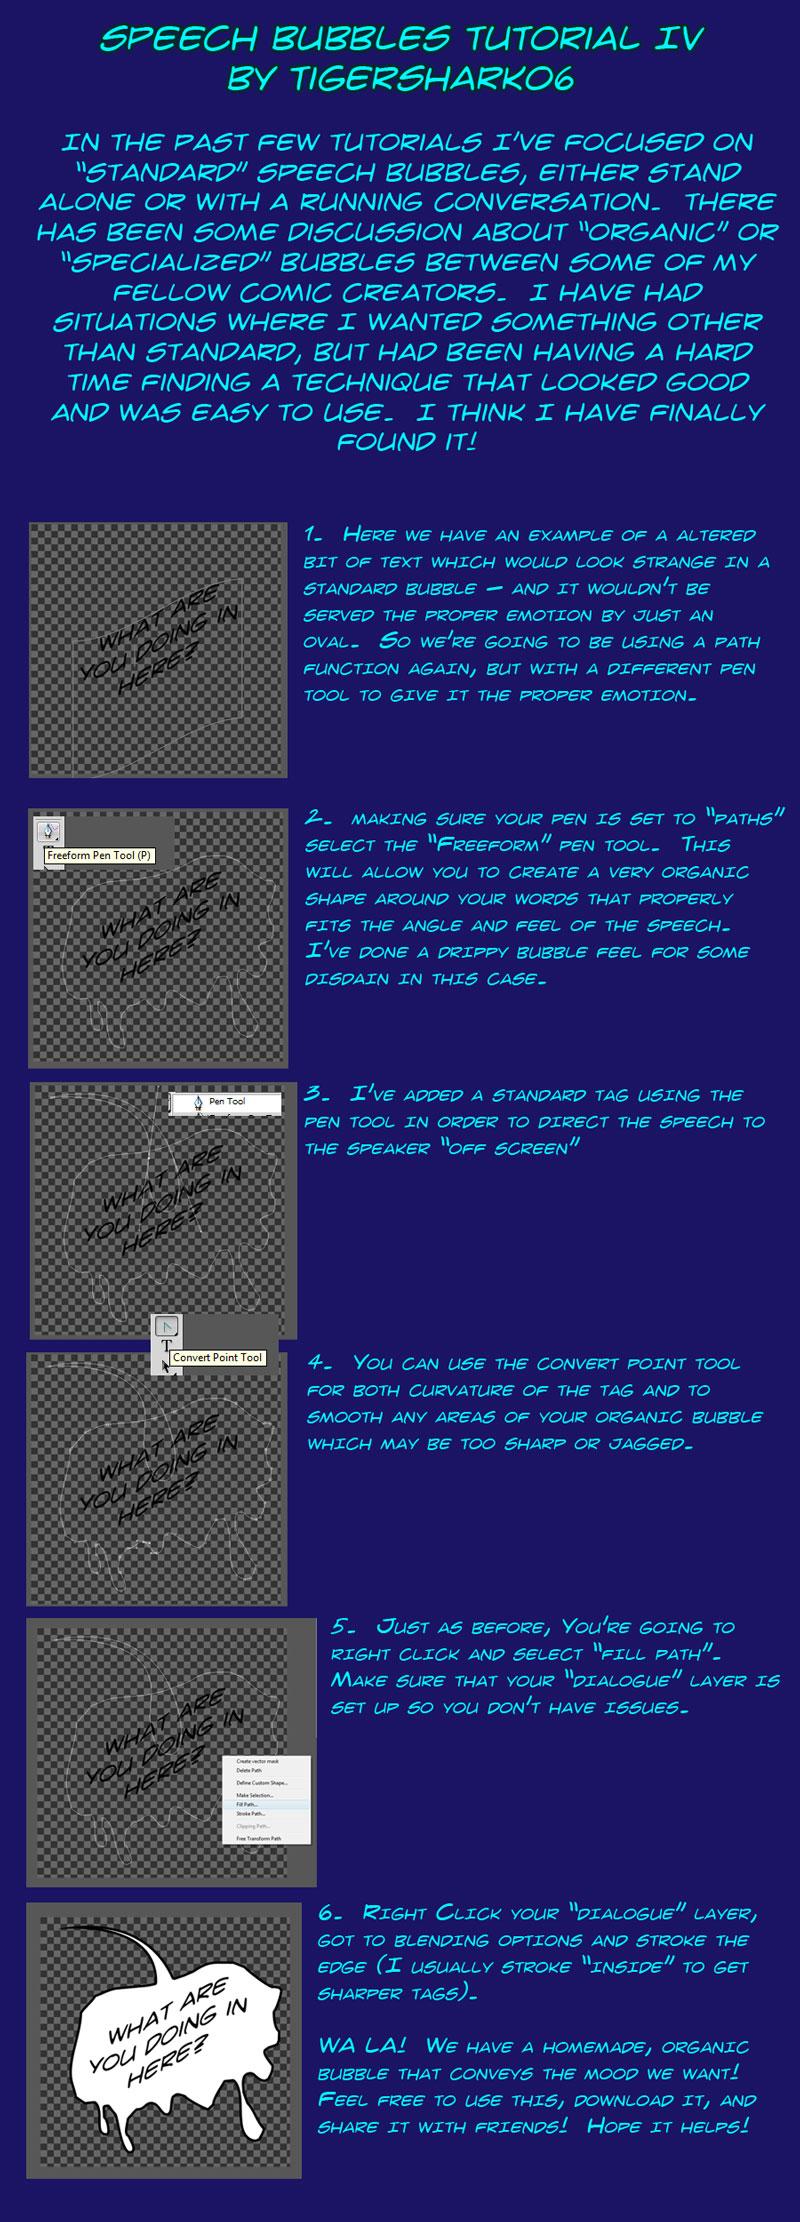 Speech Bubbles Tutorial IV by Tigershark06